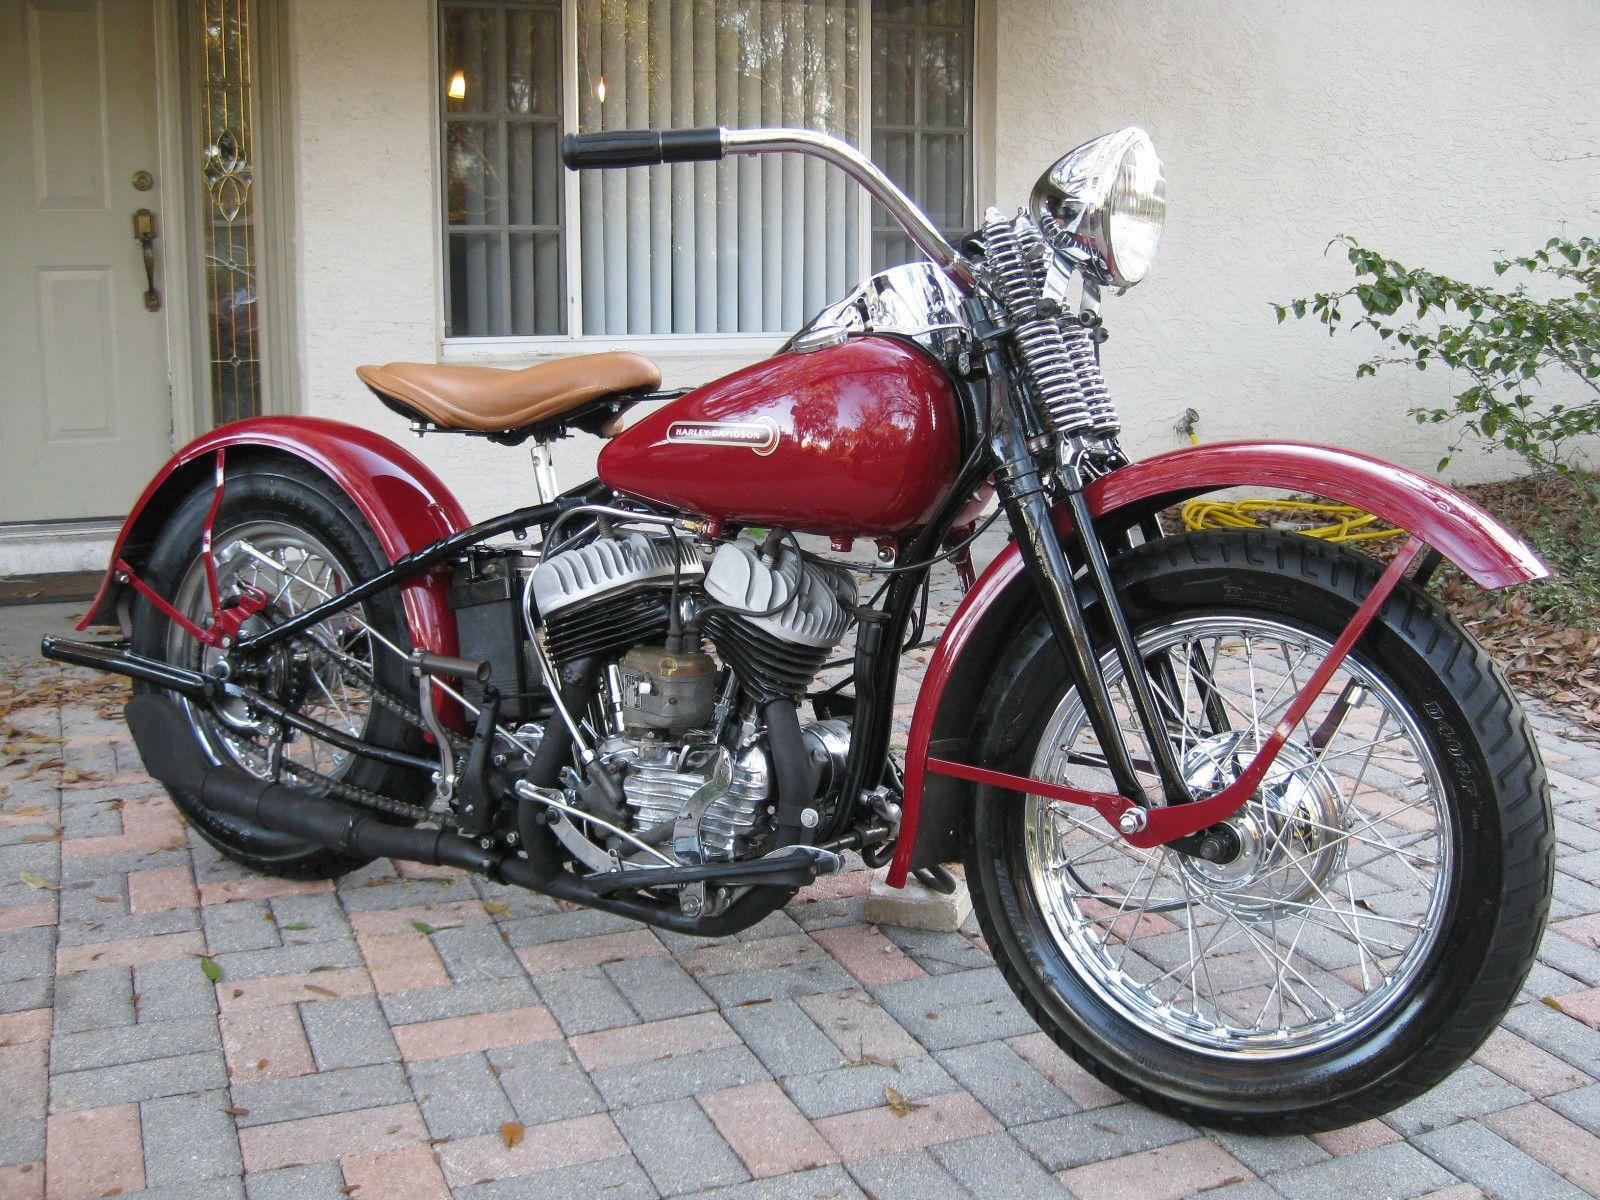 of 1940 Harley Davidson UL Flathead Motorcycle by Hank